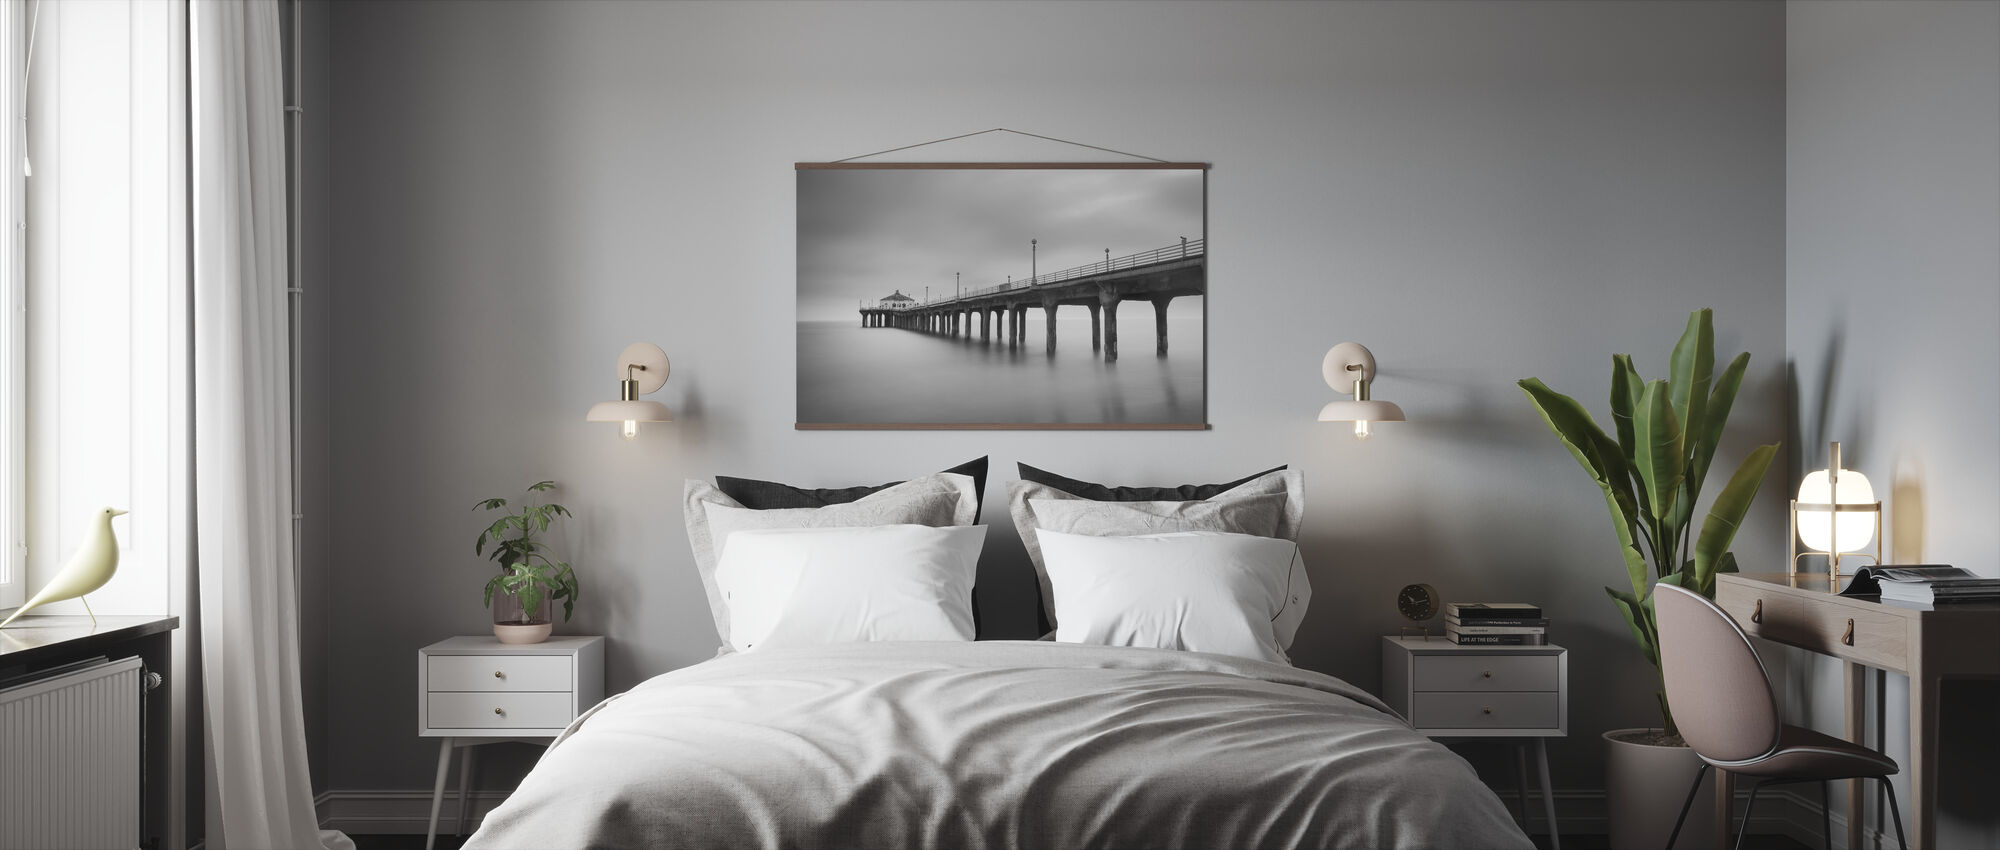 Manhattan Pier - Poster - Bedroom